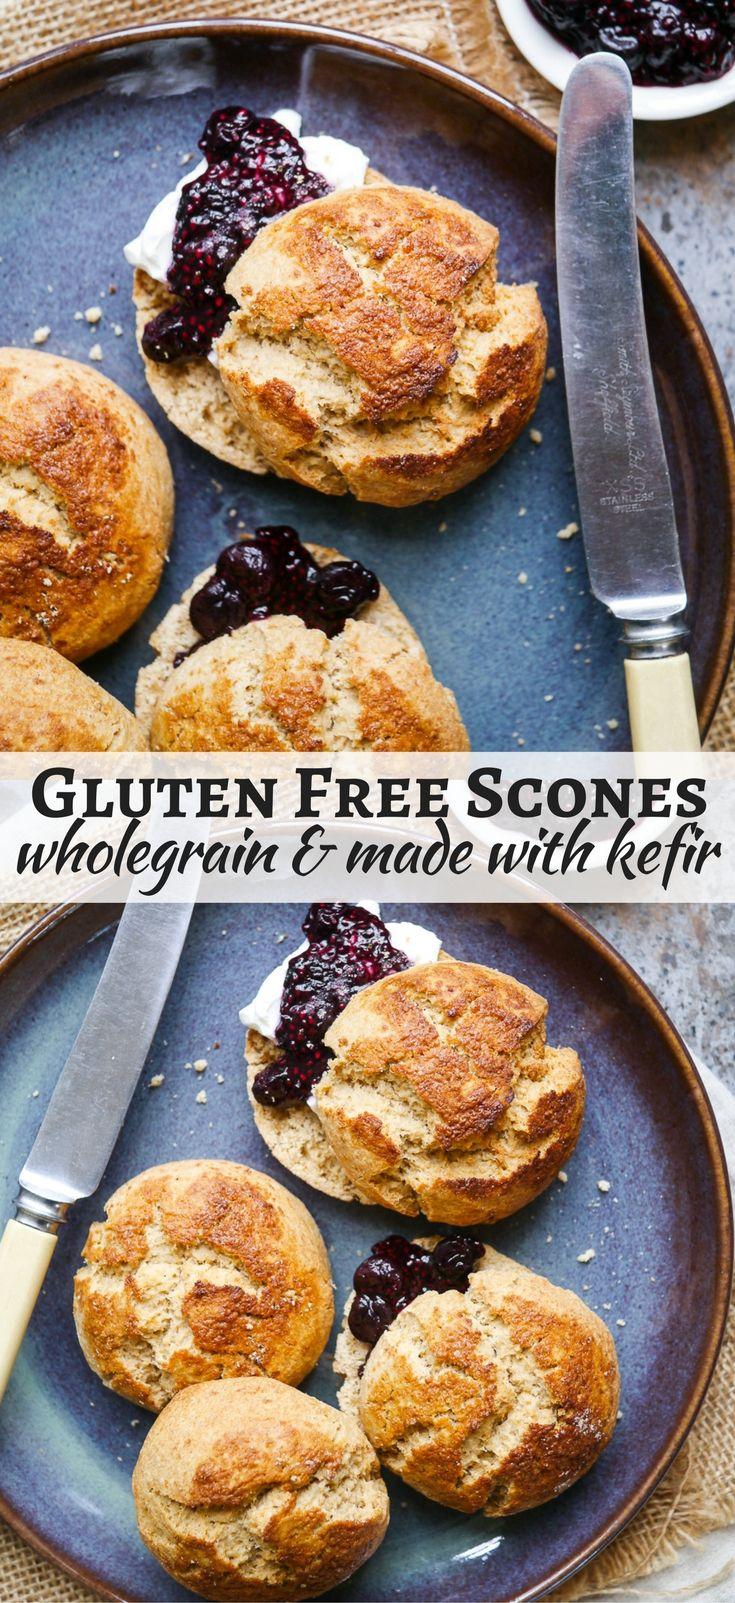 Wholegrain Gluten Free Kefir Scones (gluten free, soy free, egg free) - recipe by Nourish Everyday